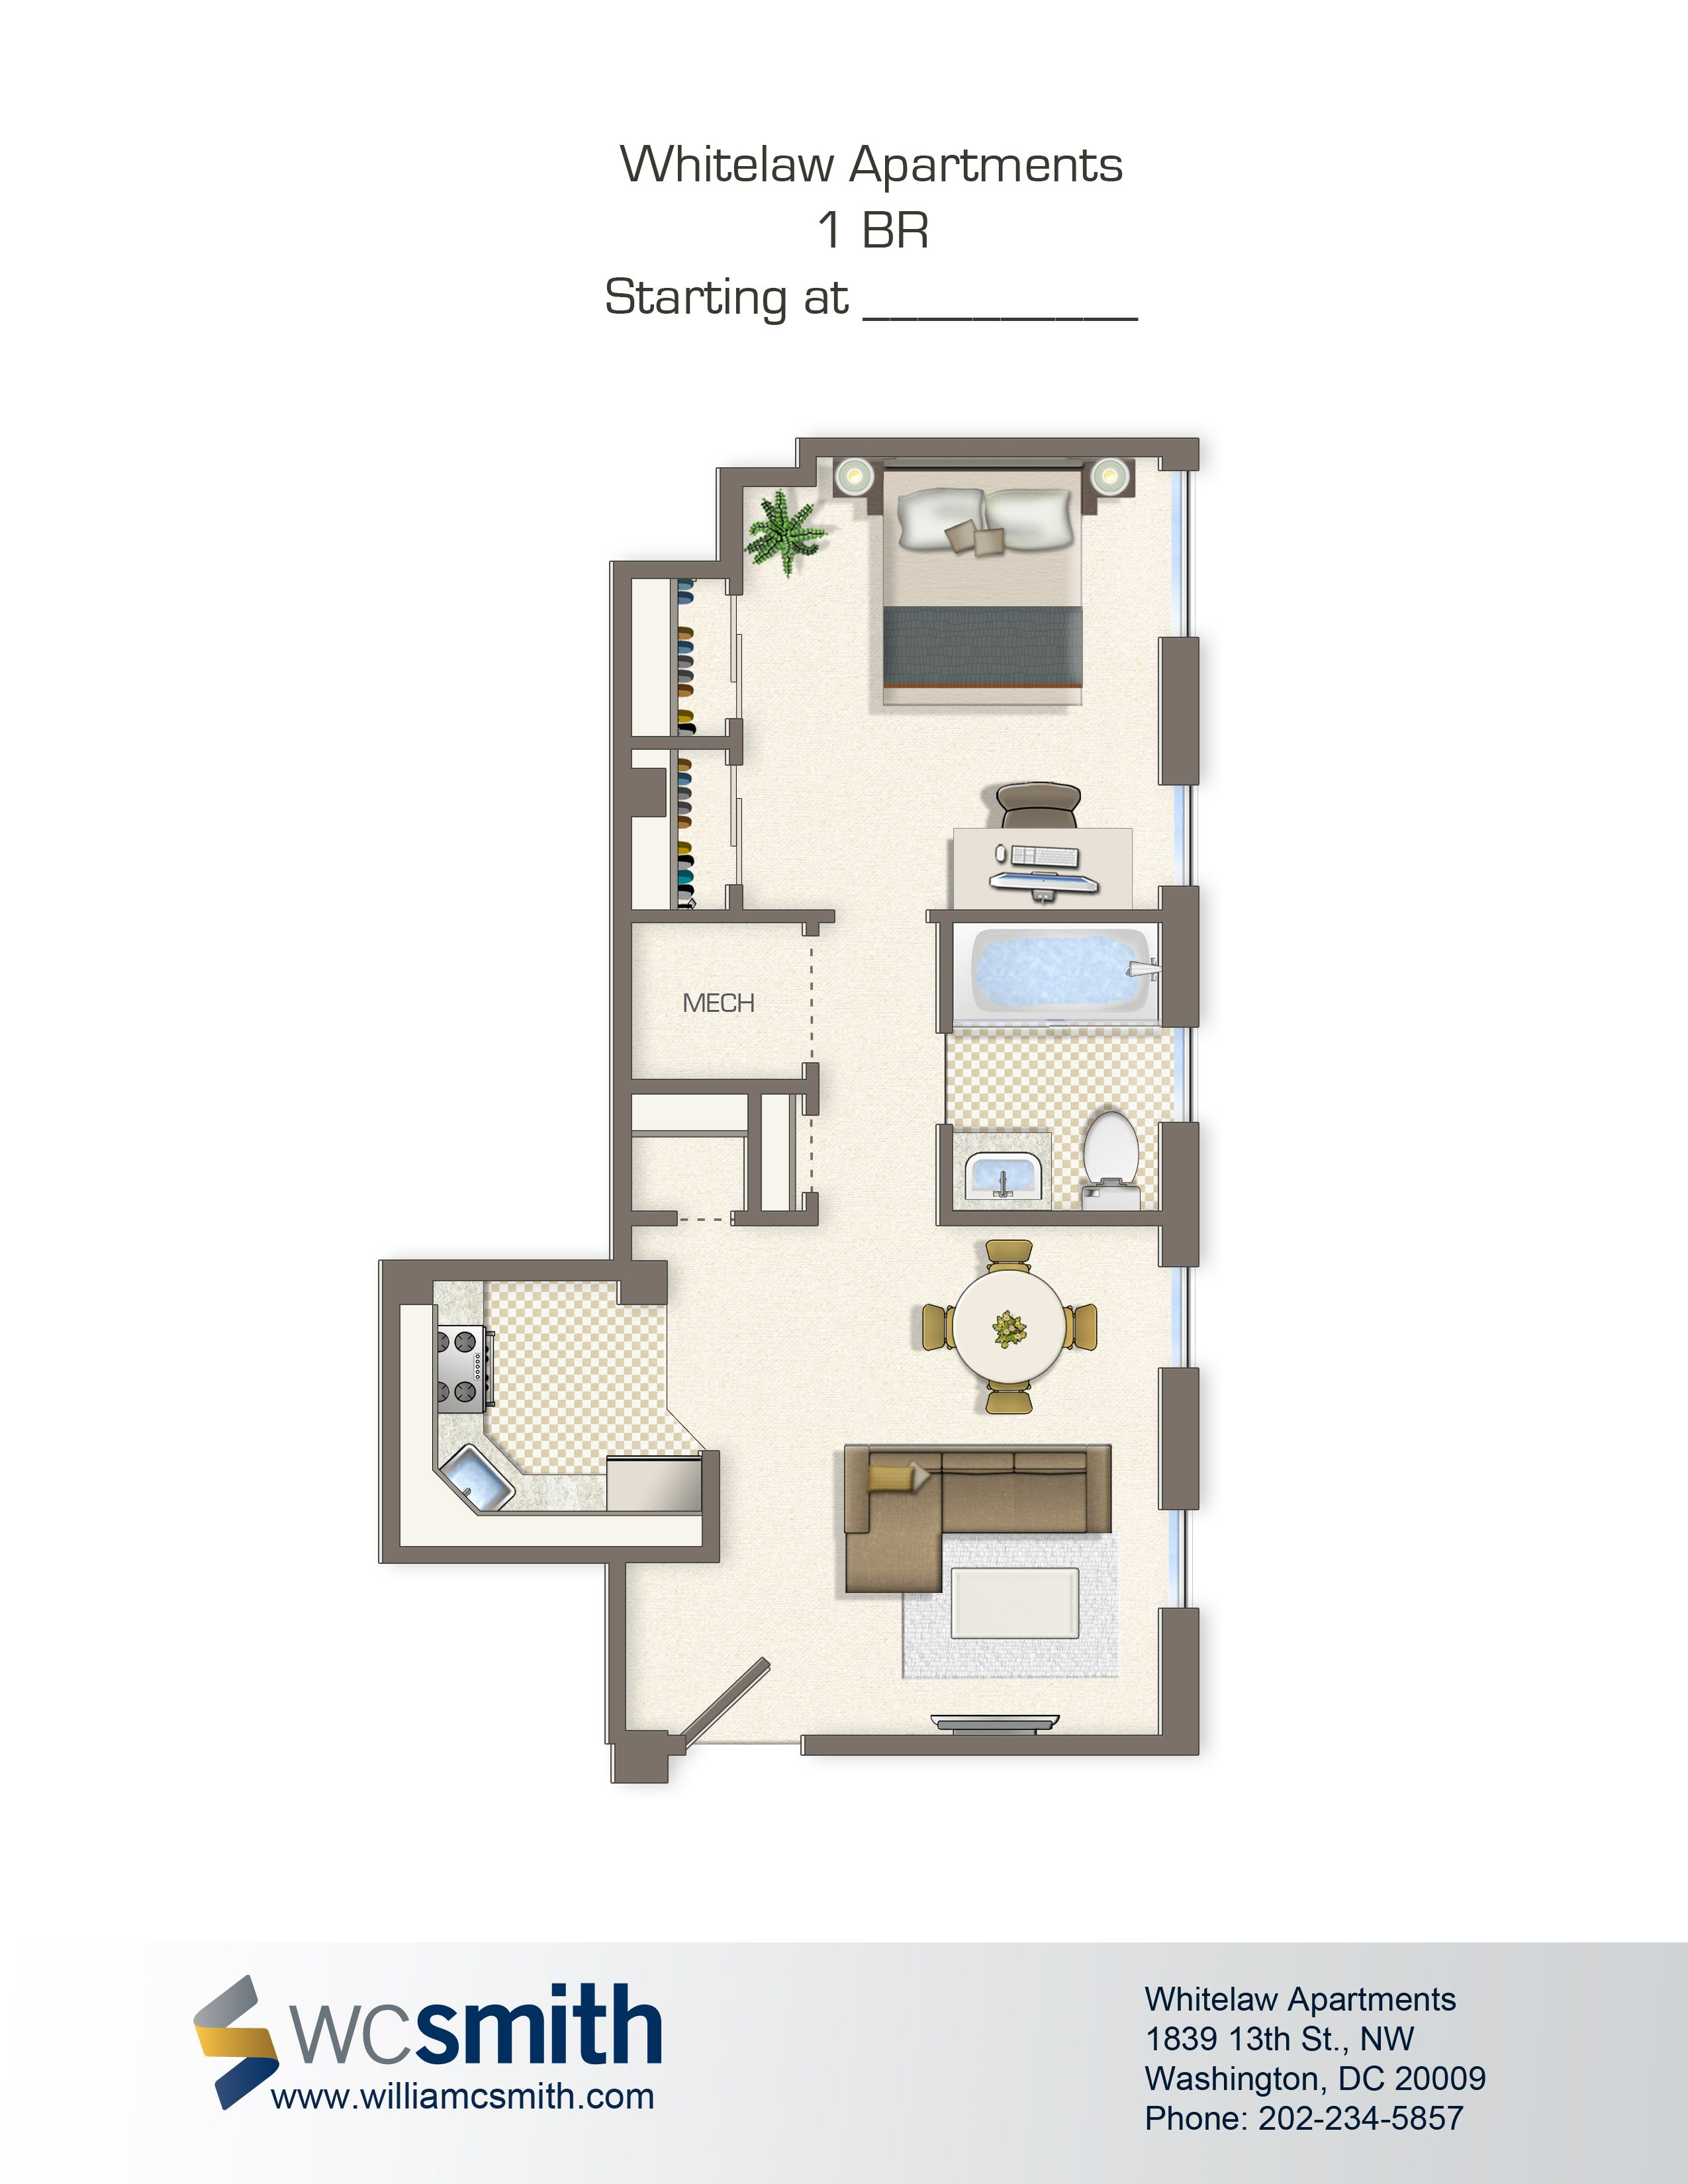 One Bedroom Floor Plan Whitelaw In Northwest Washington Dc Wc Smith Apartments Shaw Als